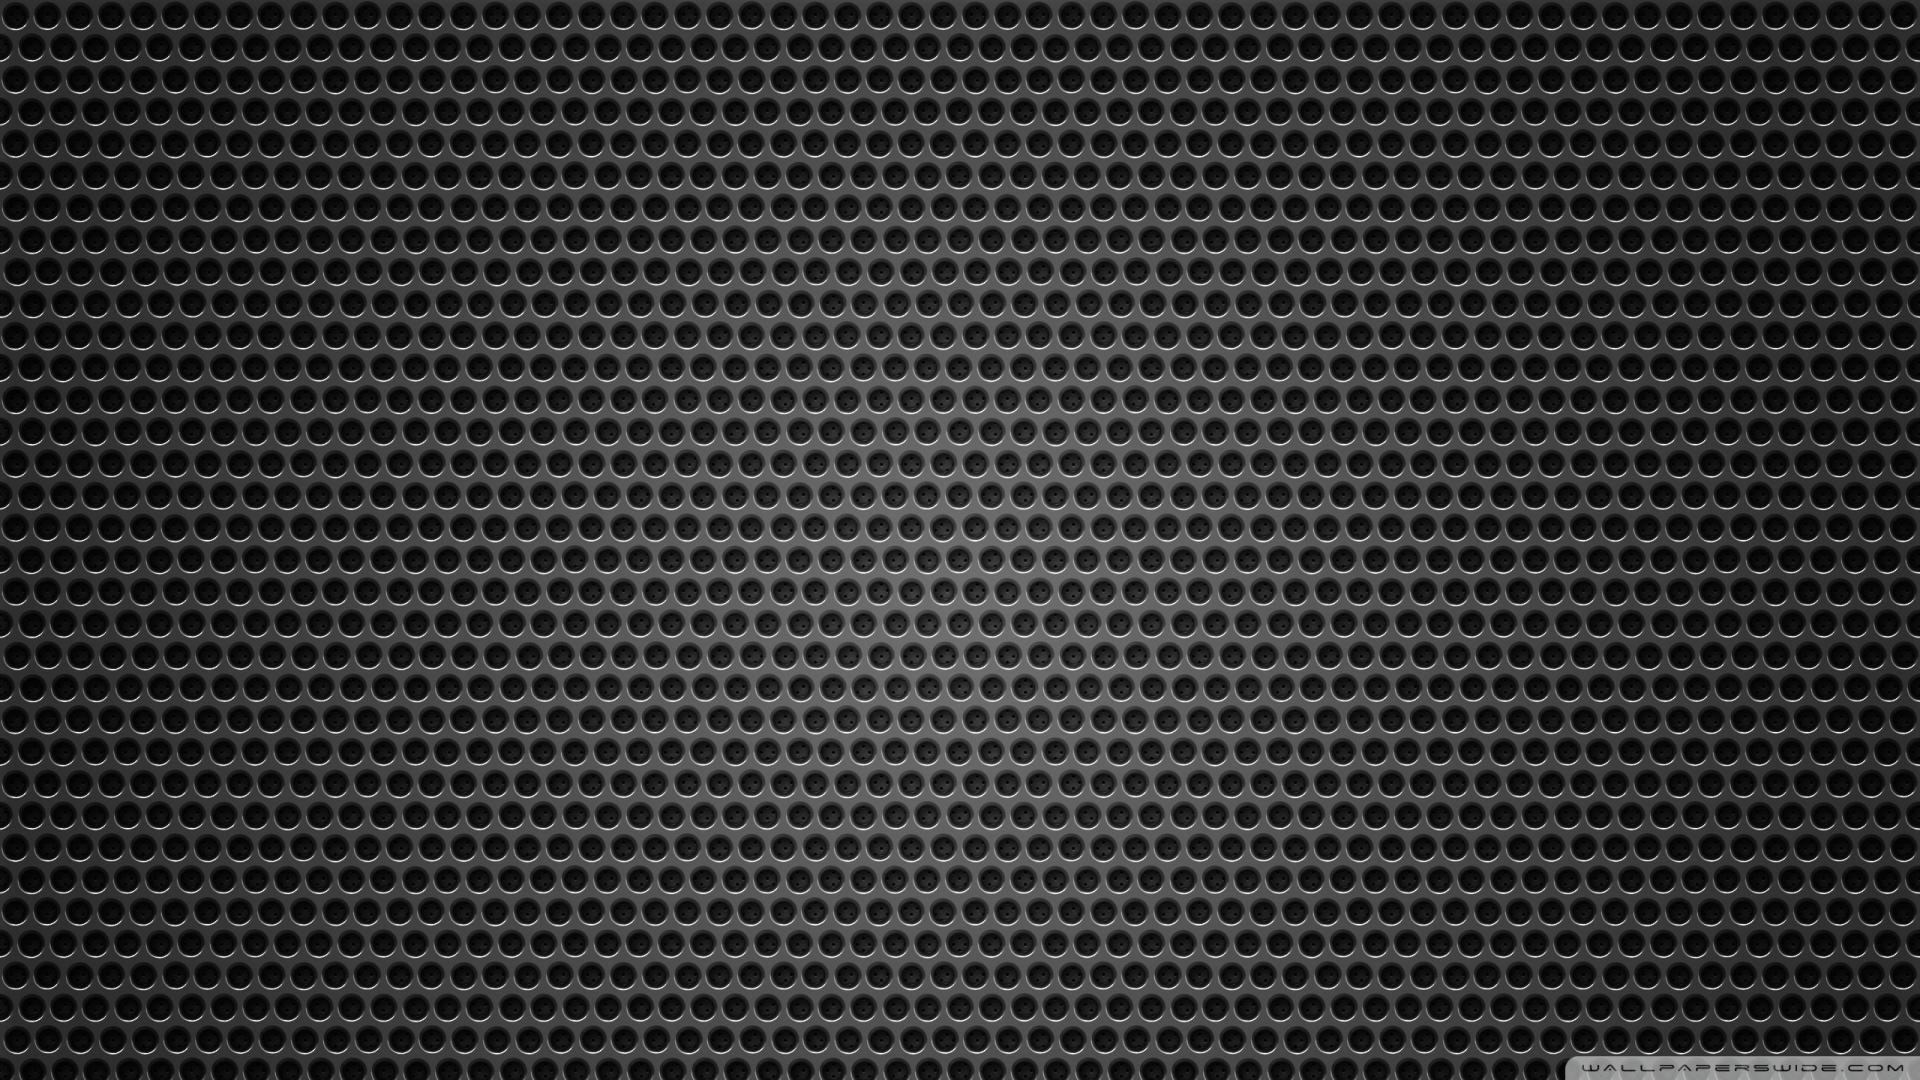 Black Background Metal Hole Wallpaper 1920x1080 Black Background 1920x1080